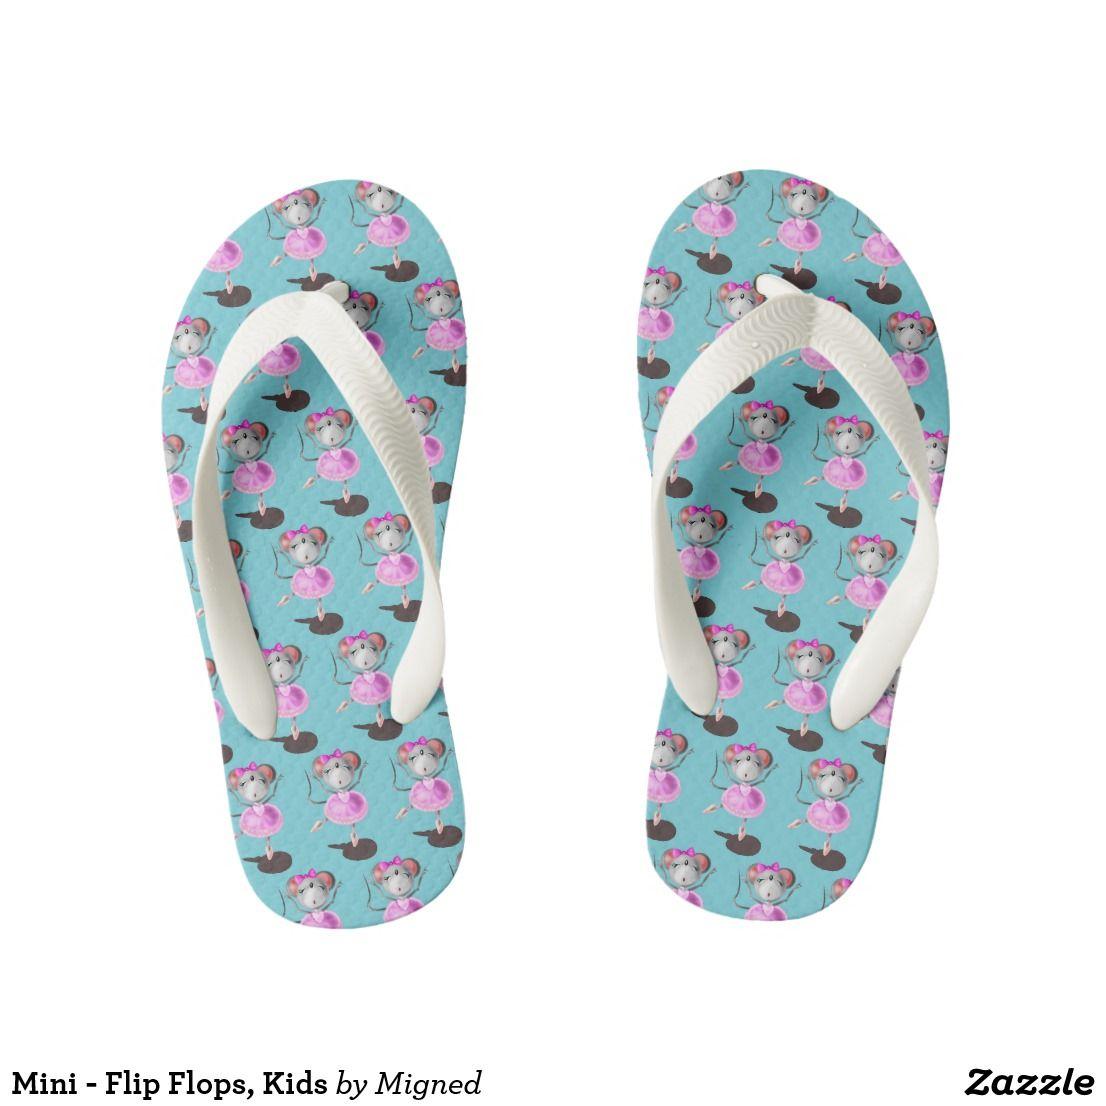 c24c3d6688db1 Mini - Flip Flops